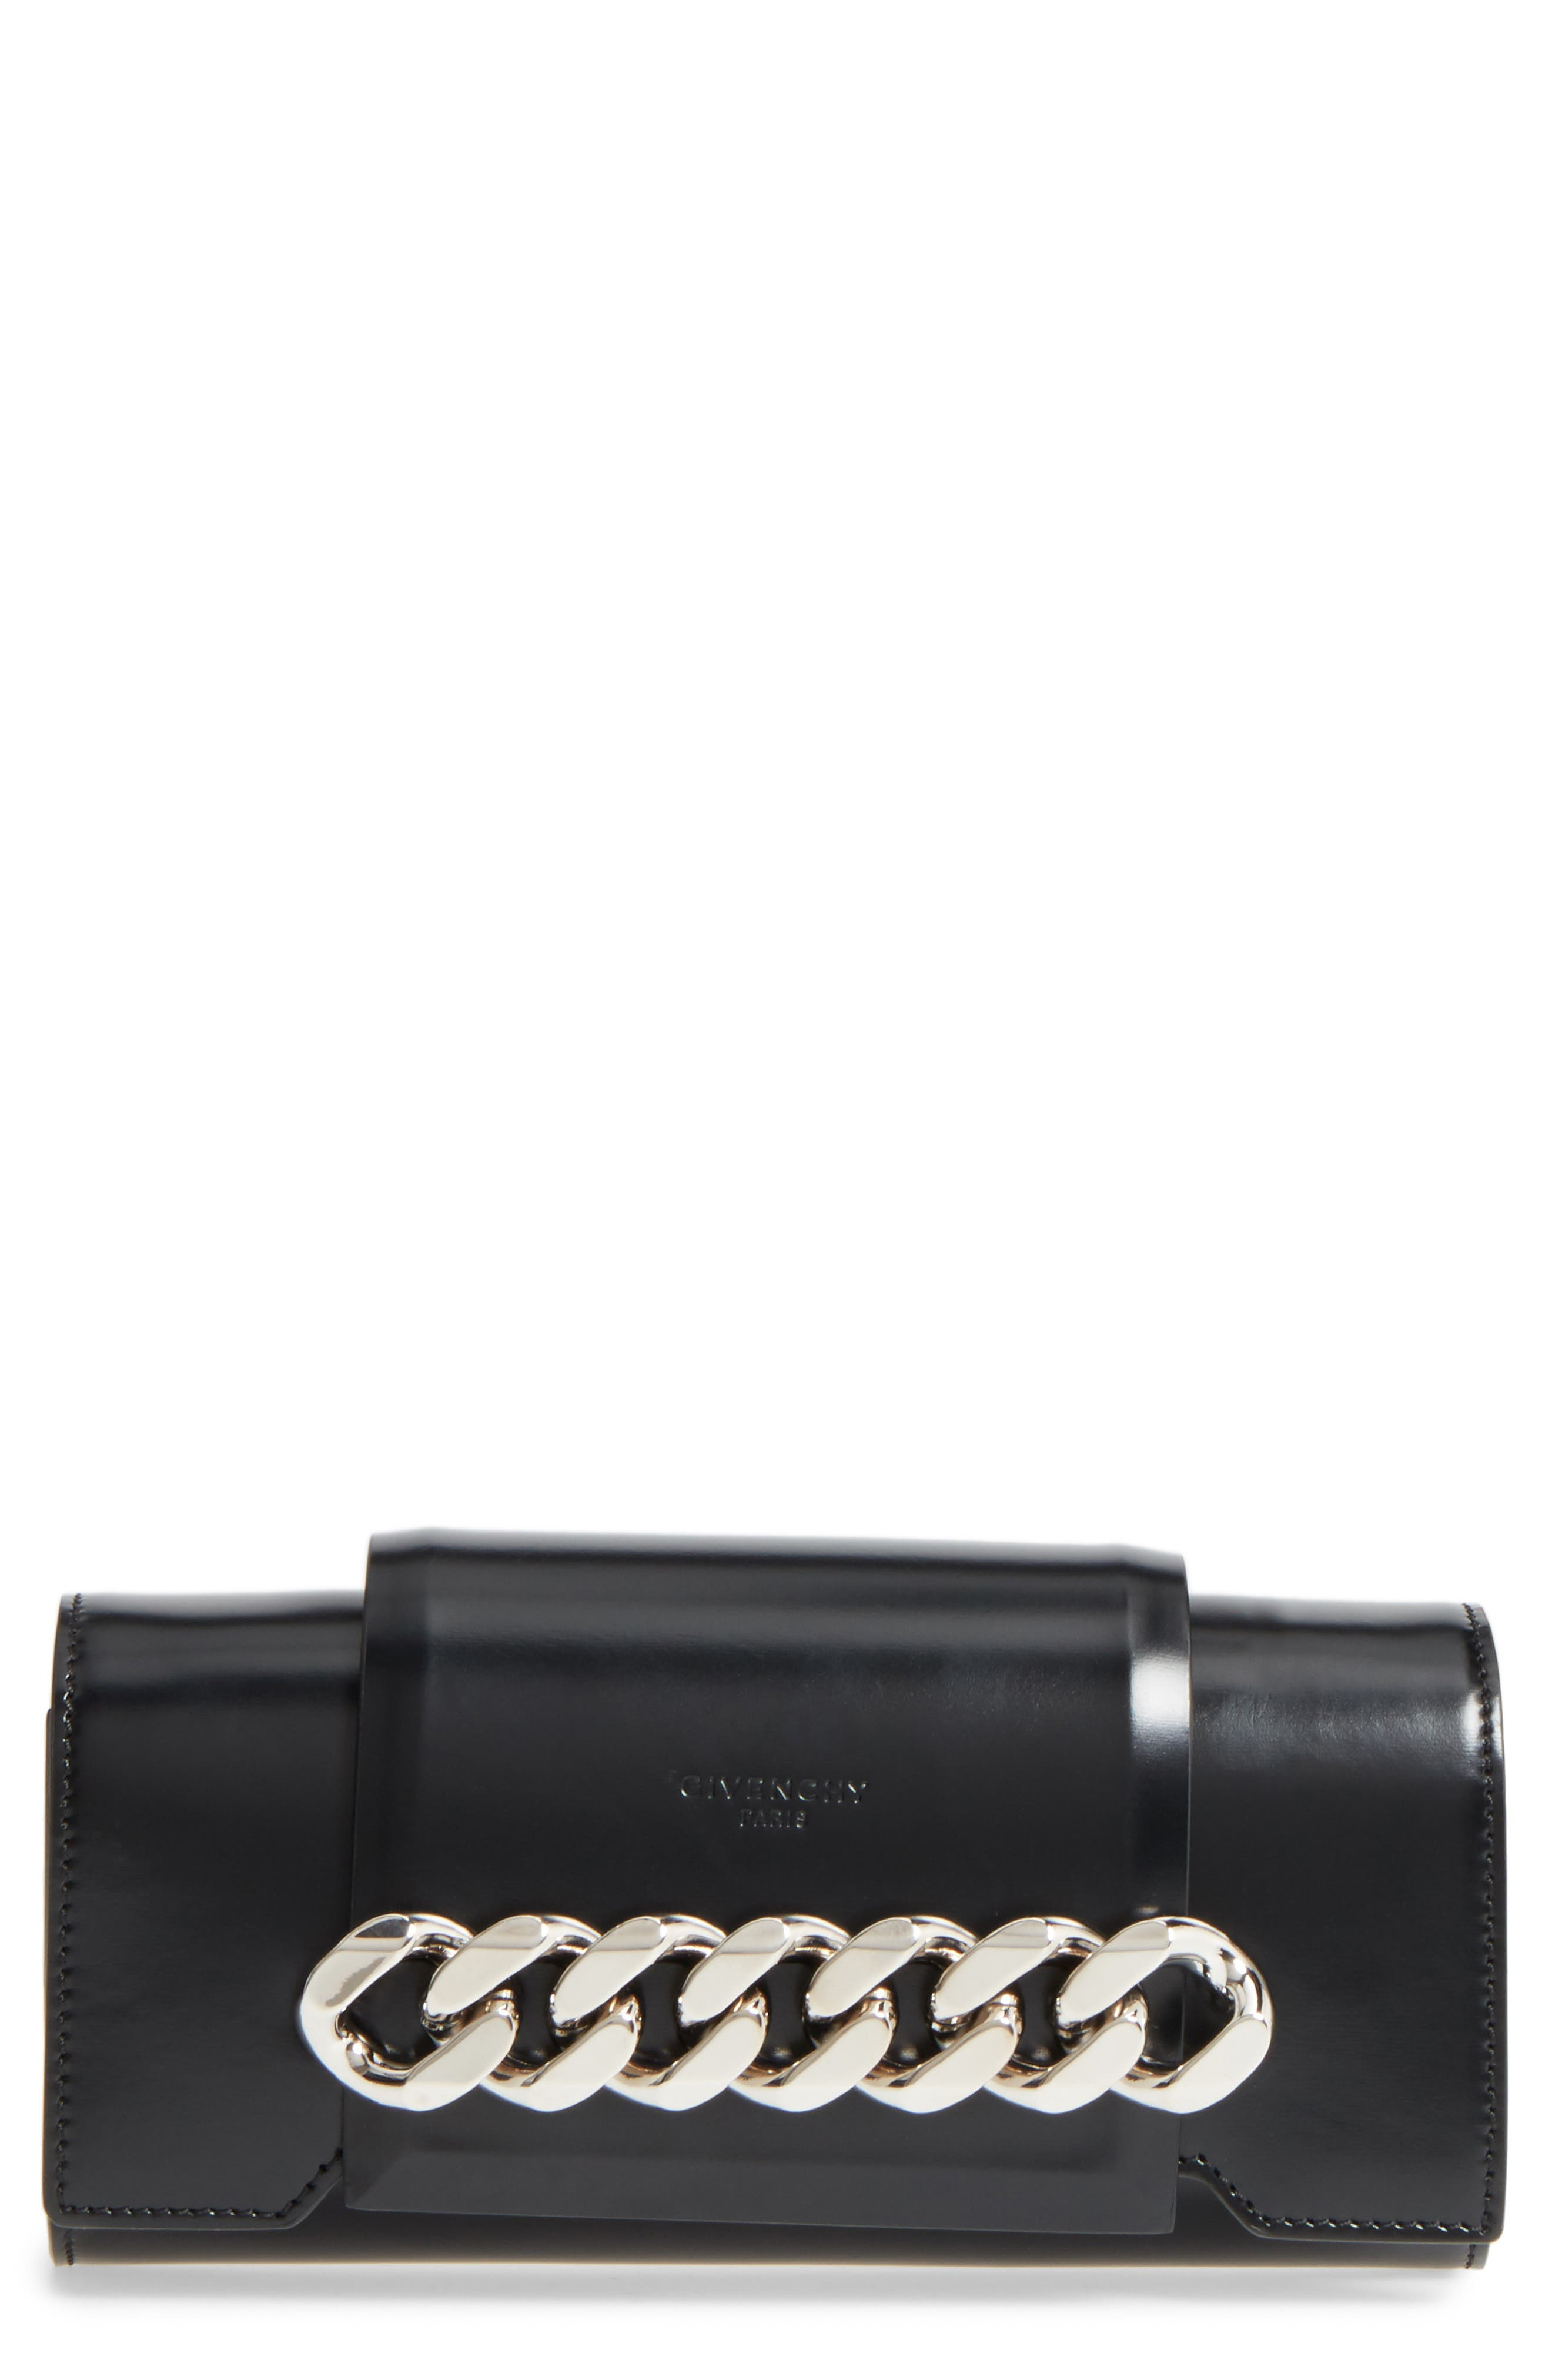 Mini Infinity Calfskin Leather Shoulder/Crossbody Bag,                         Main,                         color,